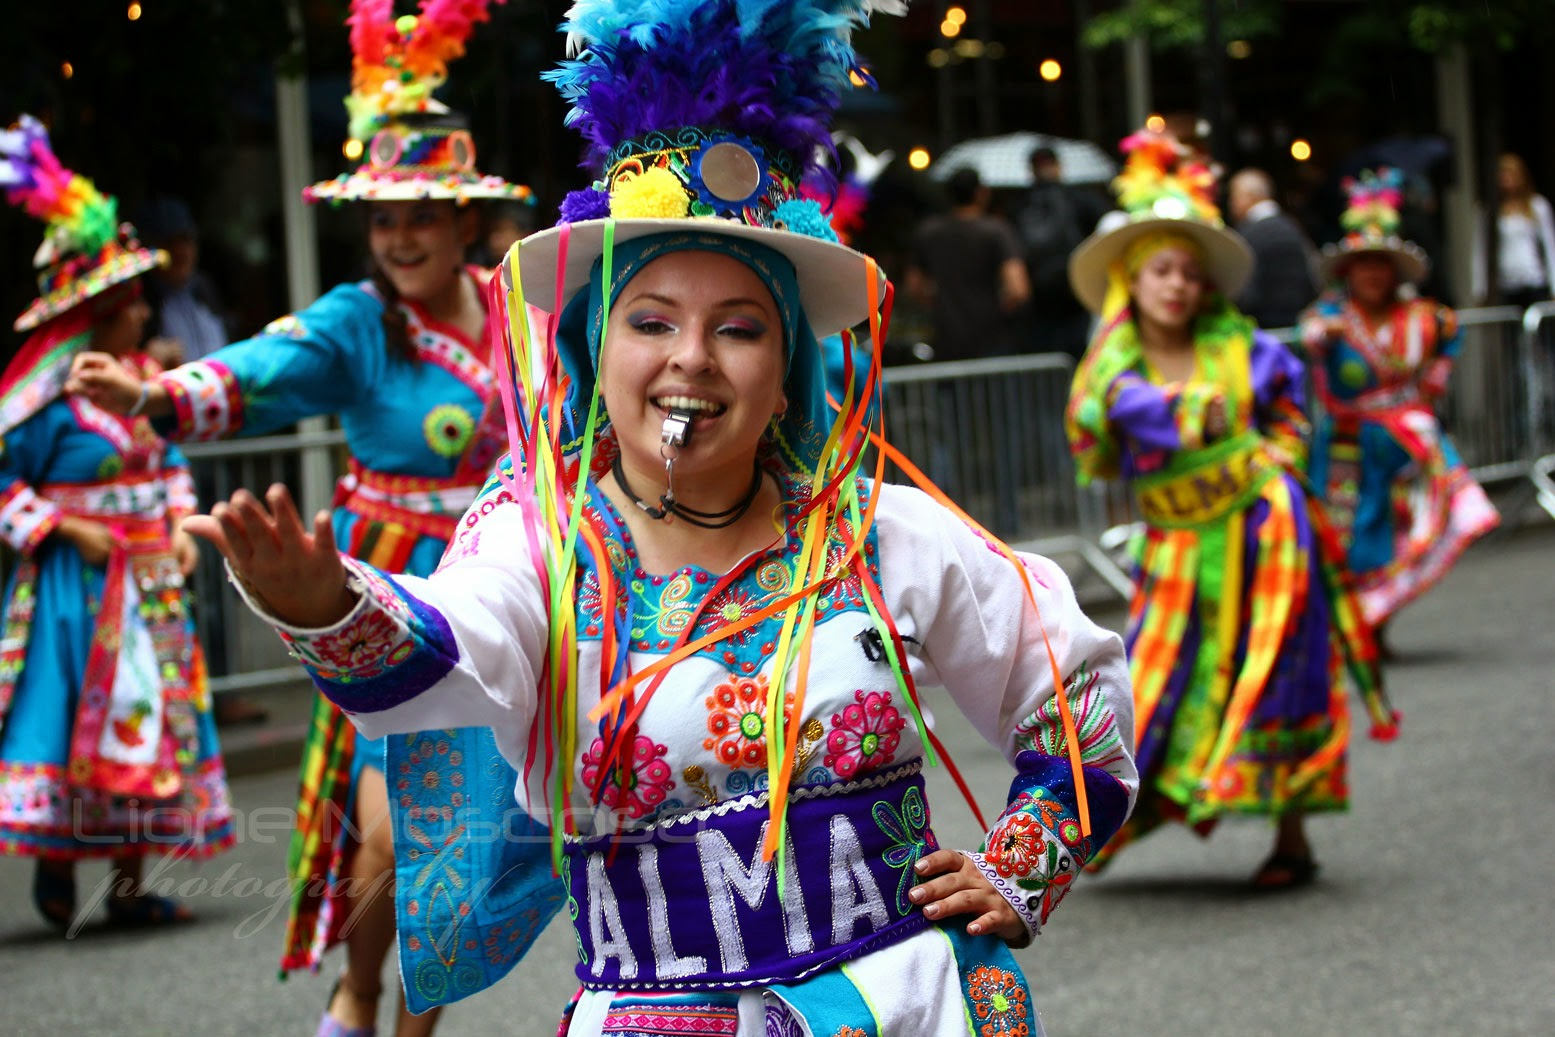 cultura folklorica boliviana - danza del Tinku